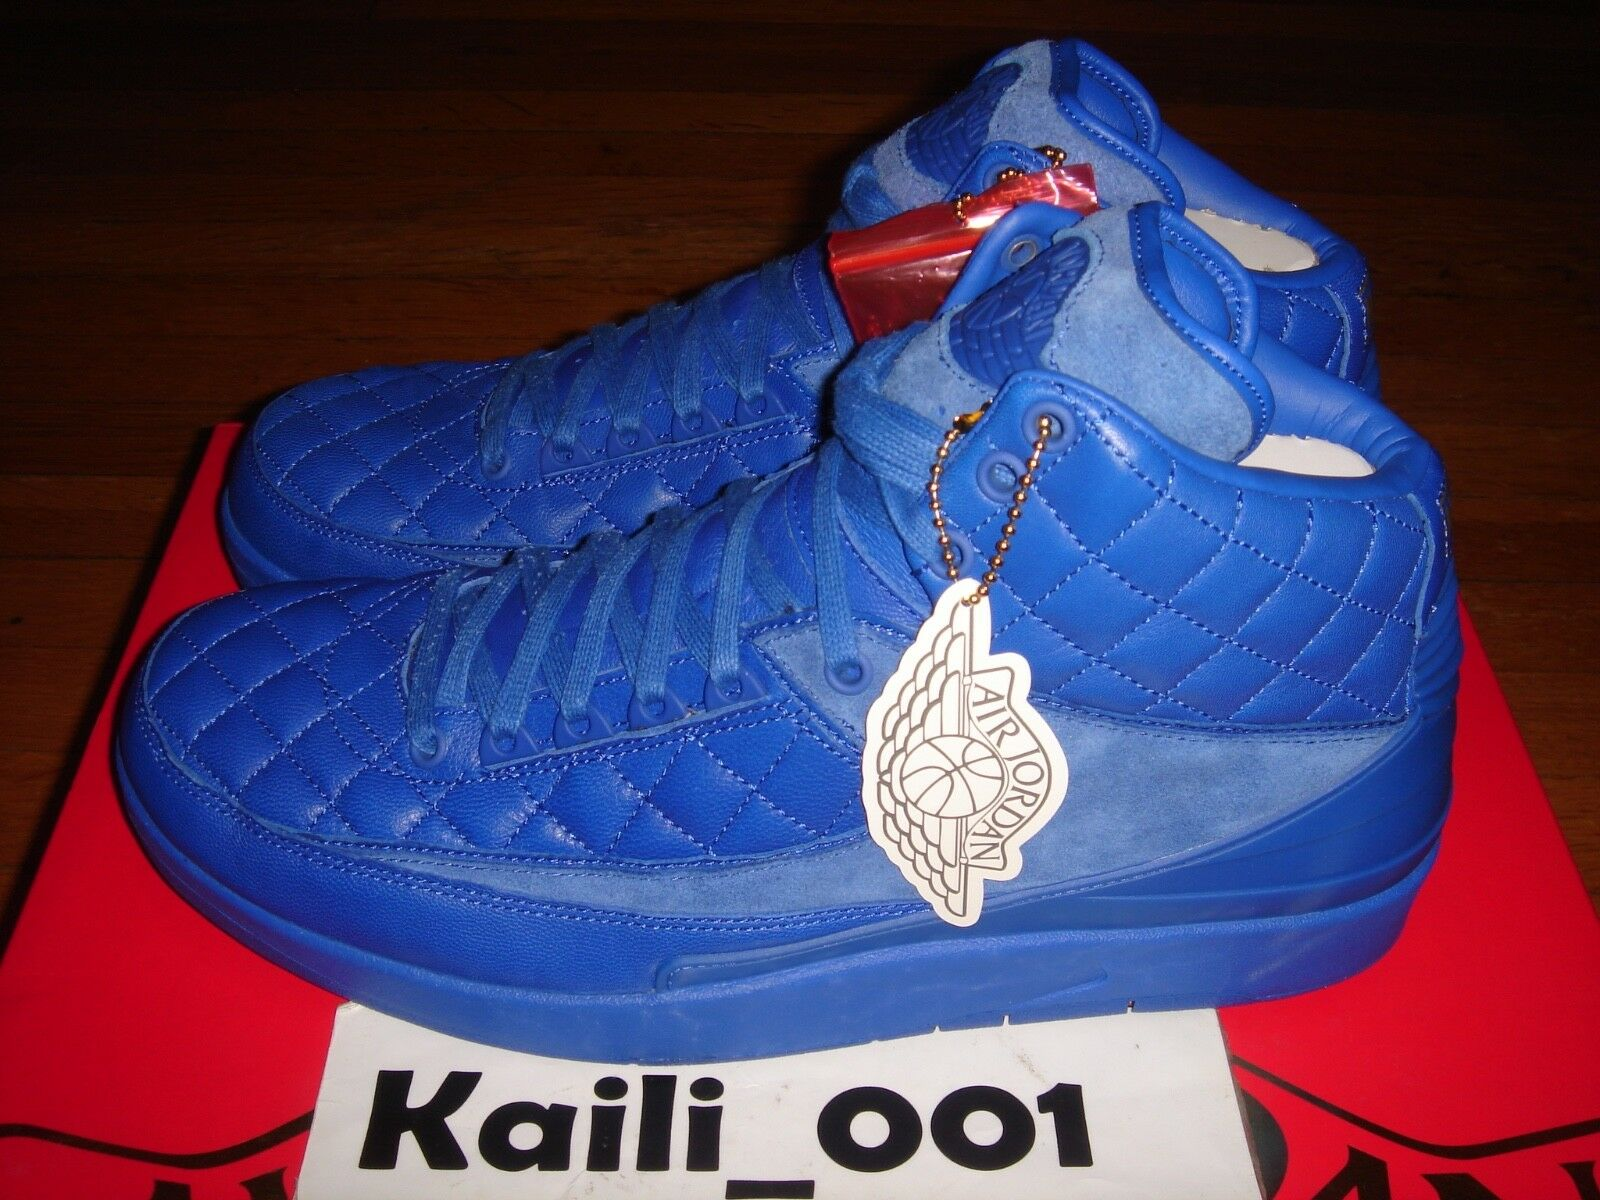 Nike Air Jordan 2 Retro Don C Size 12 717170-405 bluee BIN DB B